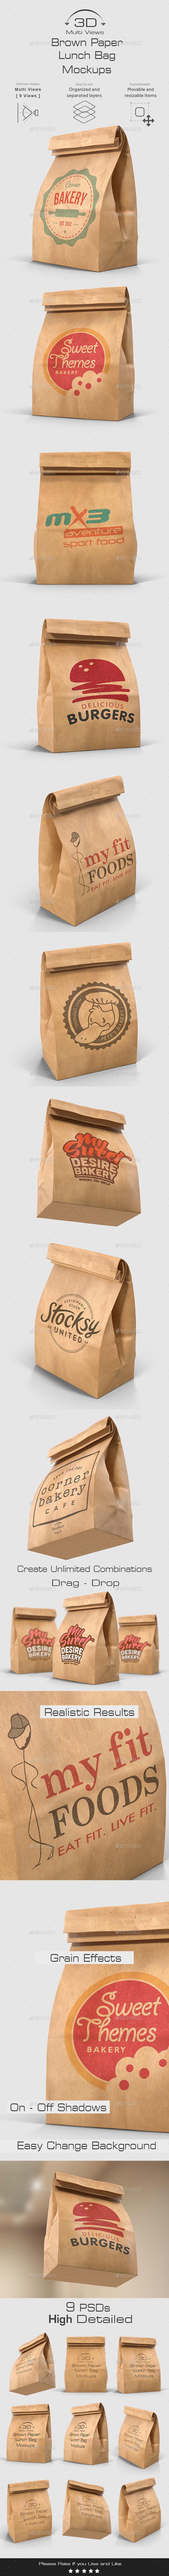 Brown Paper Lunch Bag Mockups - 3D Multi Views - Food and Drink Packaging